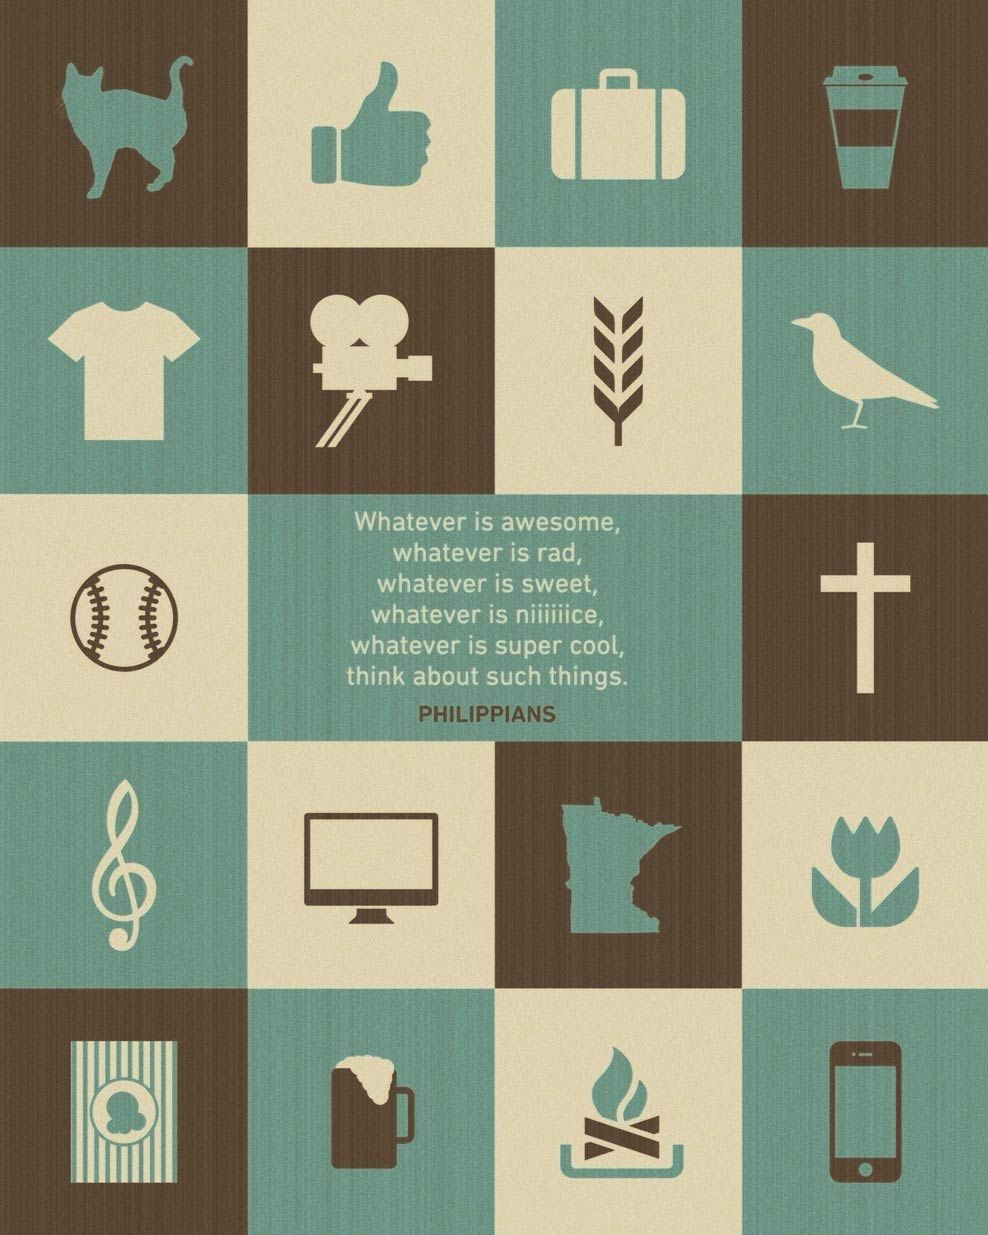 50-Philippians_988.jpg